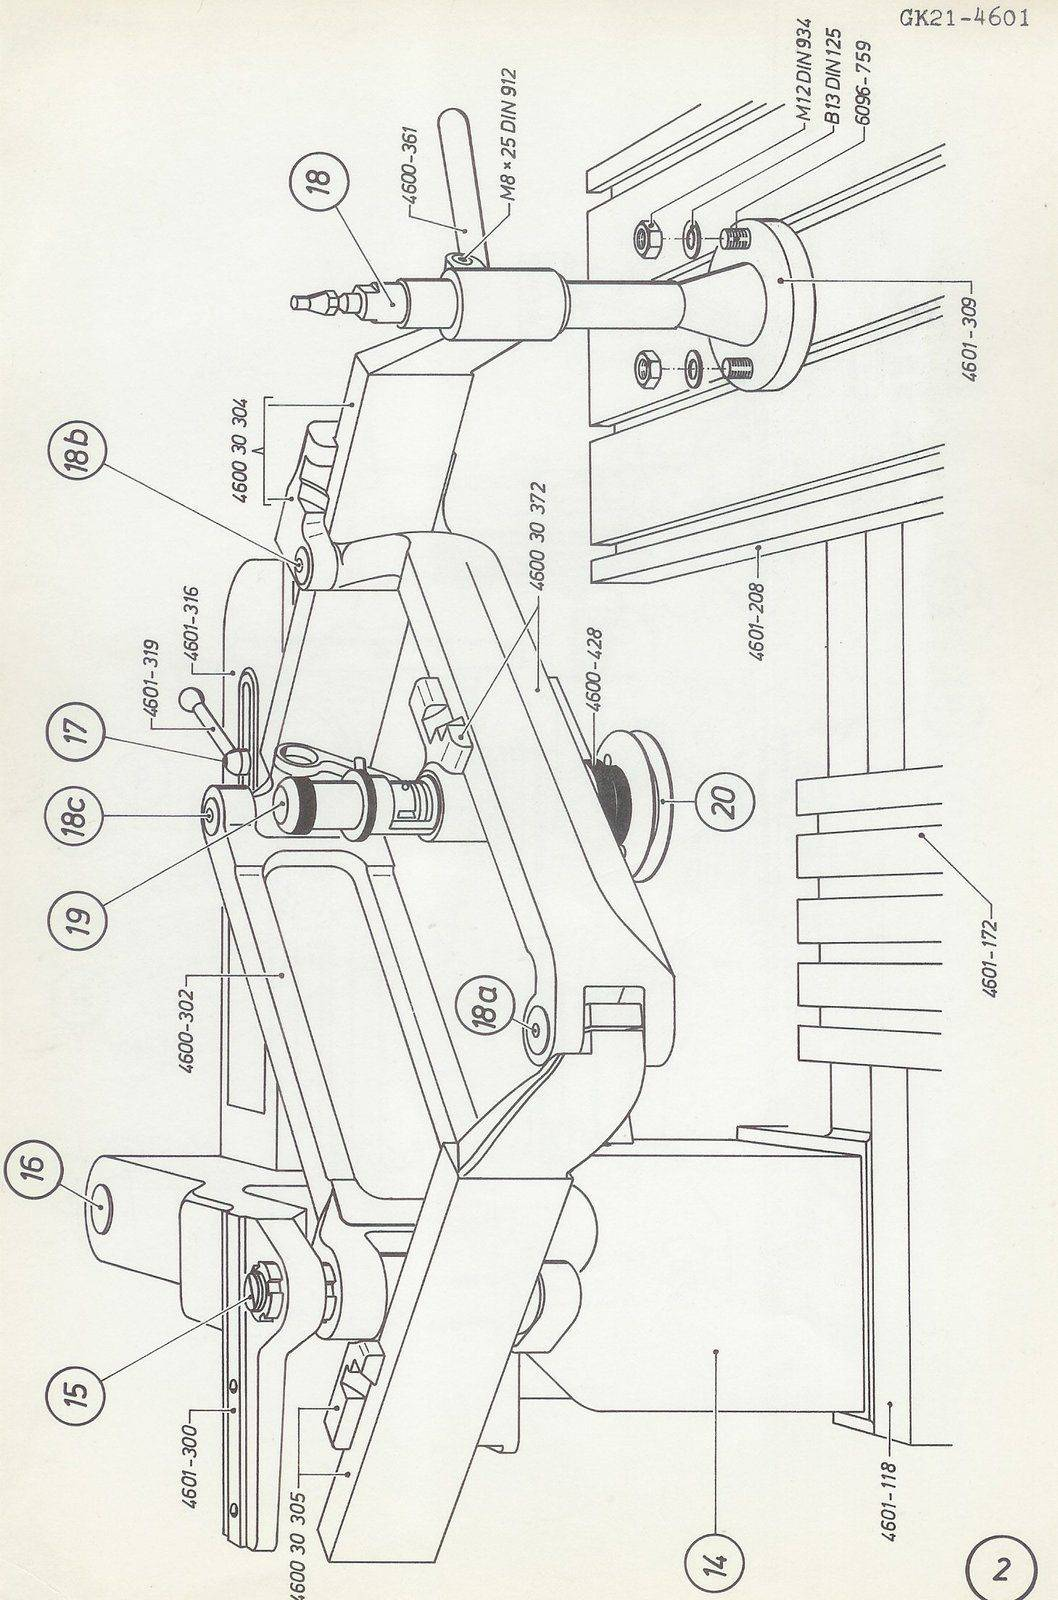 Deckel GK12-21 Parts Catalogue 1975 p2.jpg